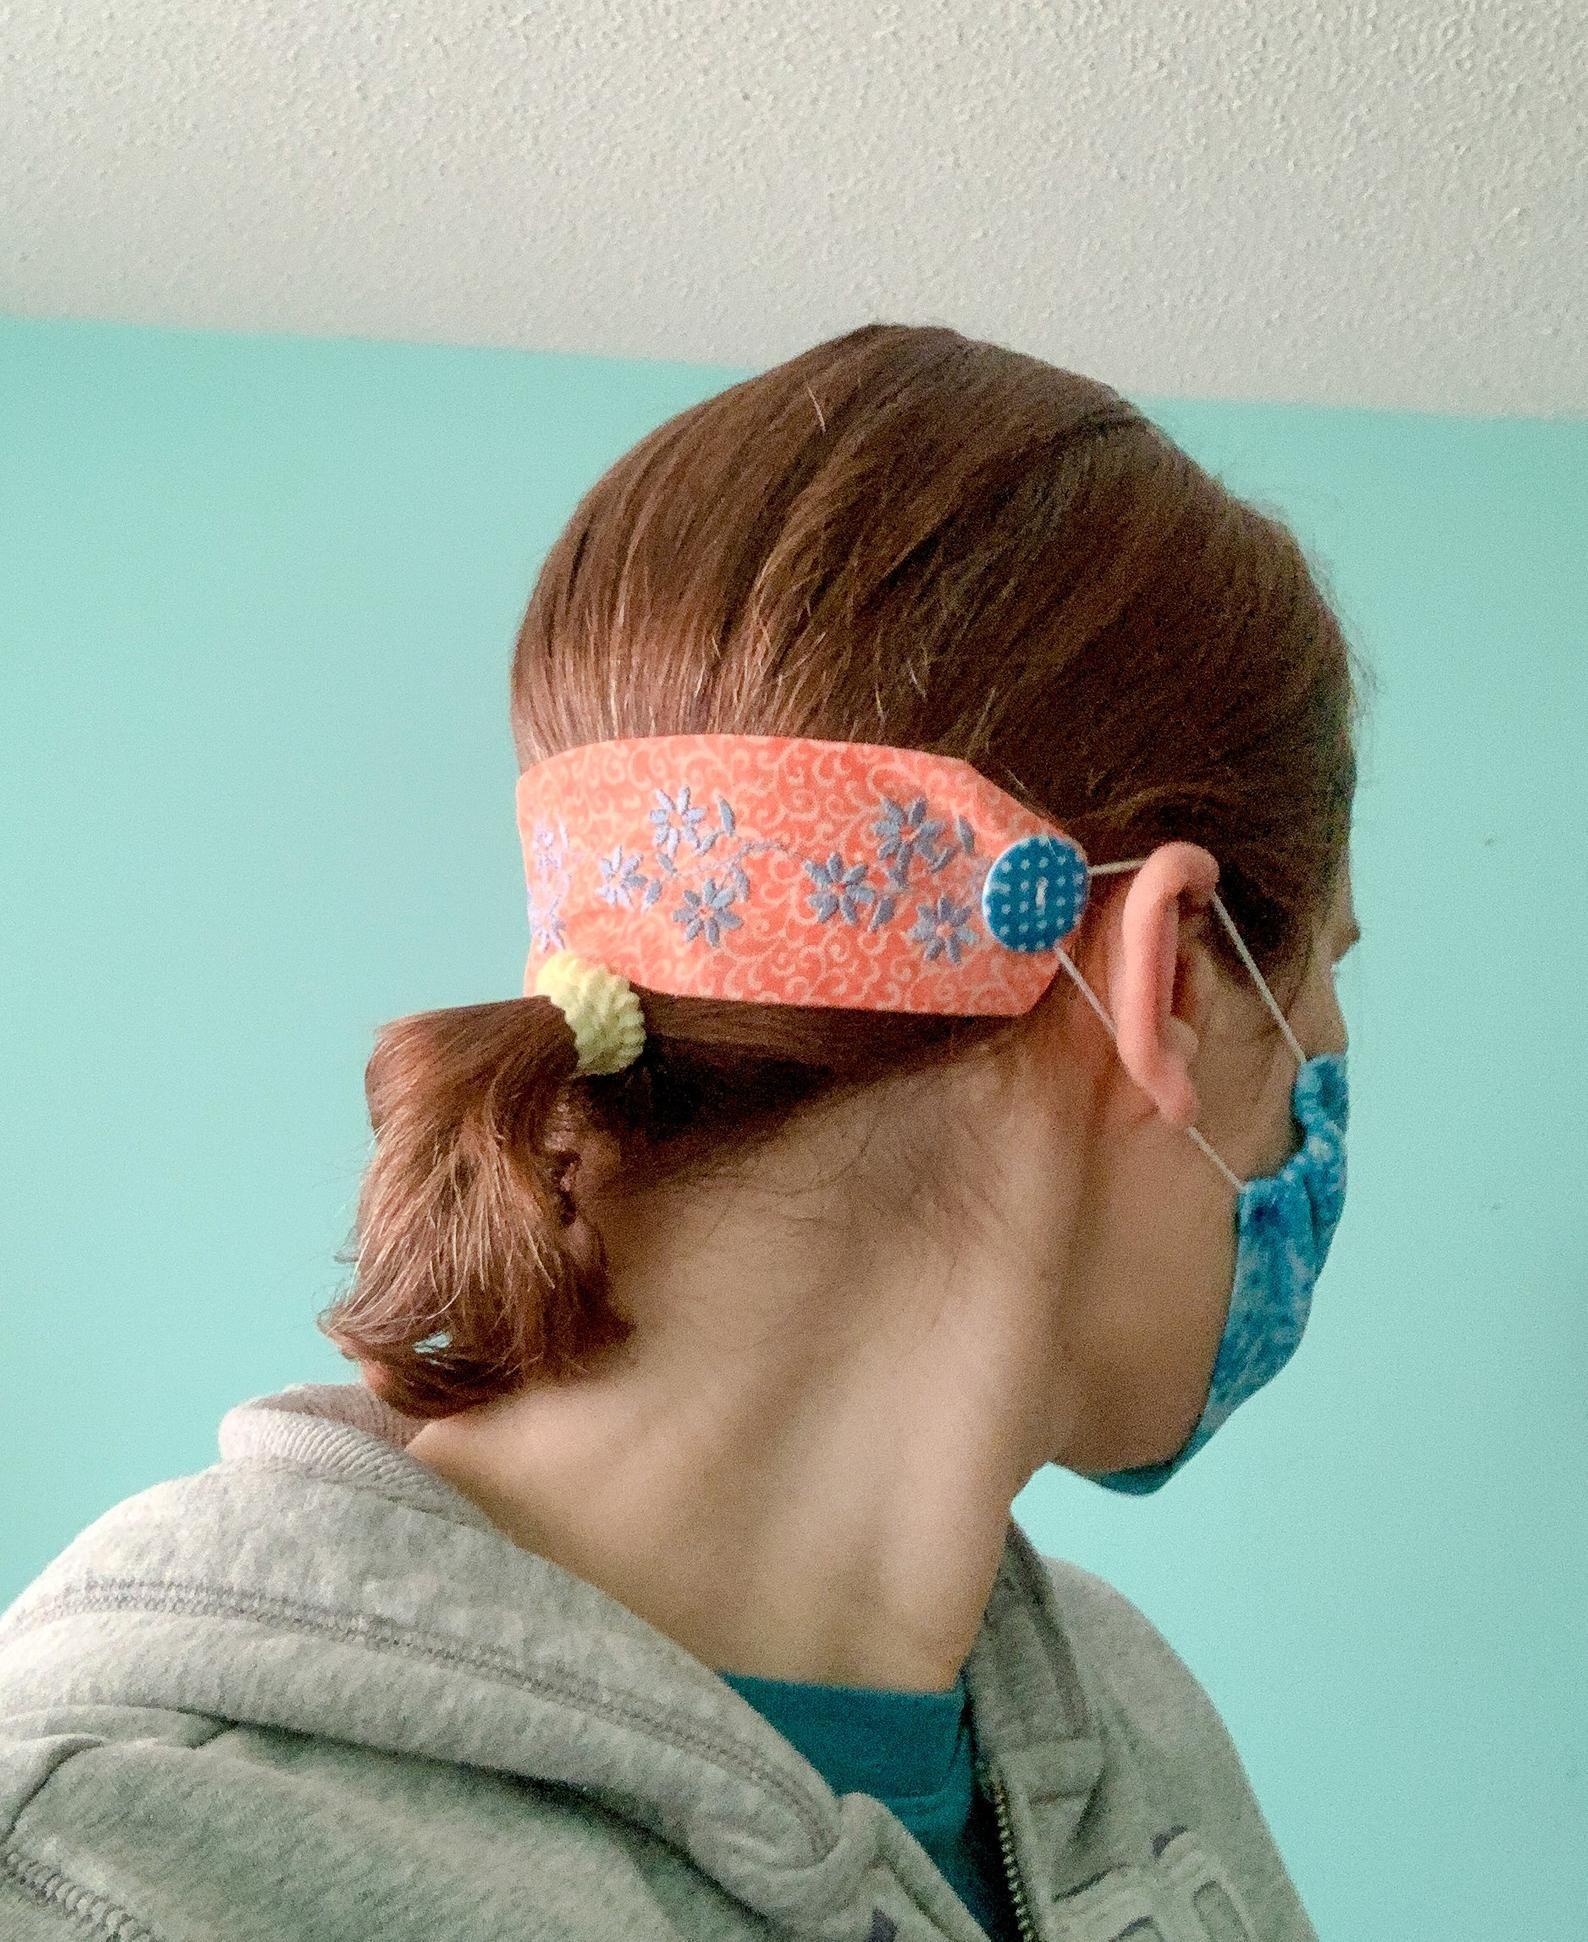 Easy Diy Ear Savers In 2020 Easy Face Mask Diy Easy Face Masks